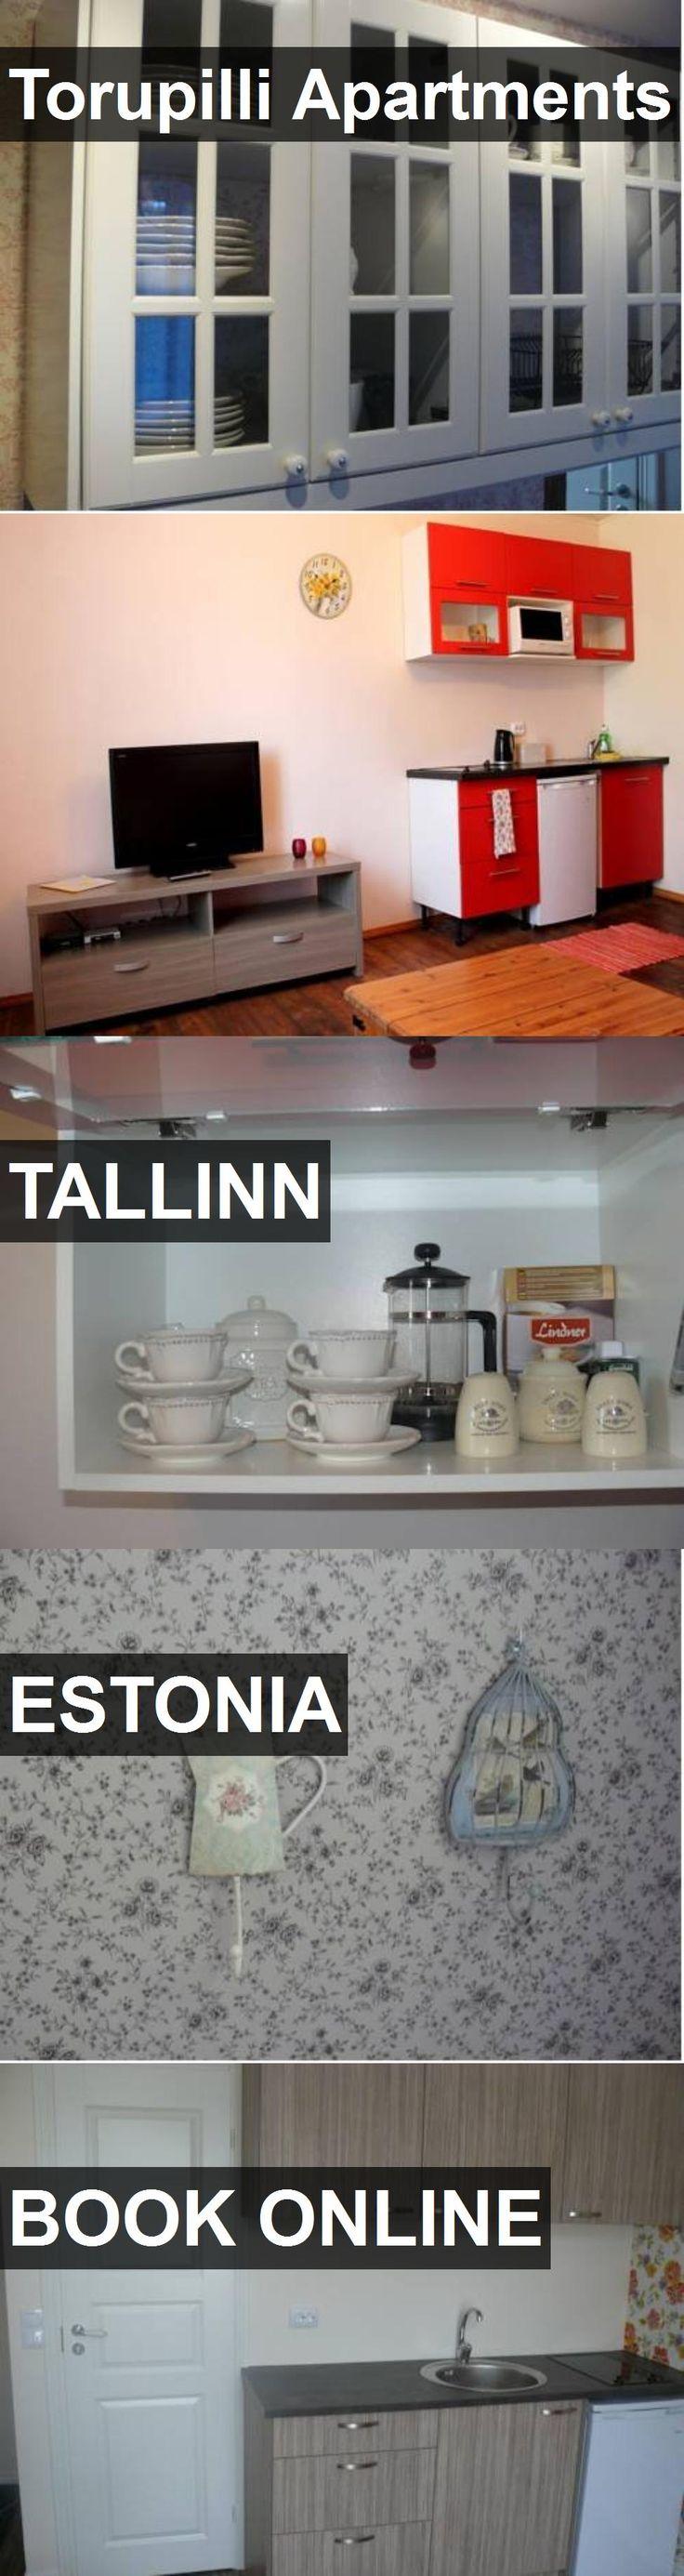 Torupilli Apartments in Tallinn, Estonia. For more information, photos, reviews and best prices please follow the link. #Estonia #Tallinn #travel #vacation #apartment